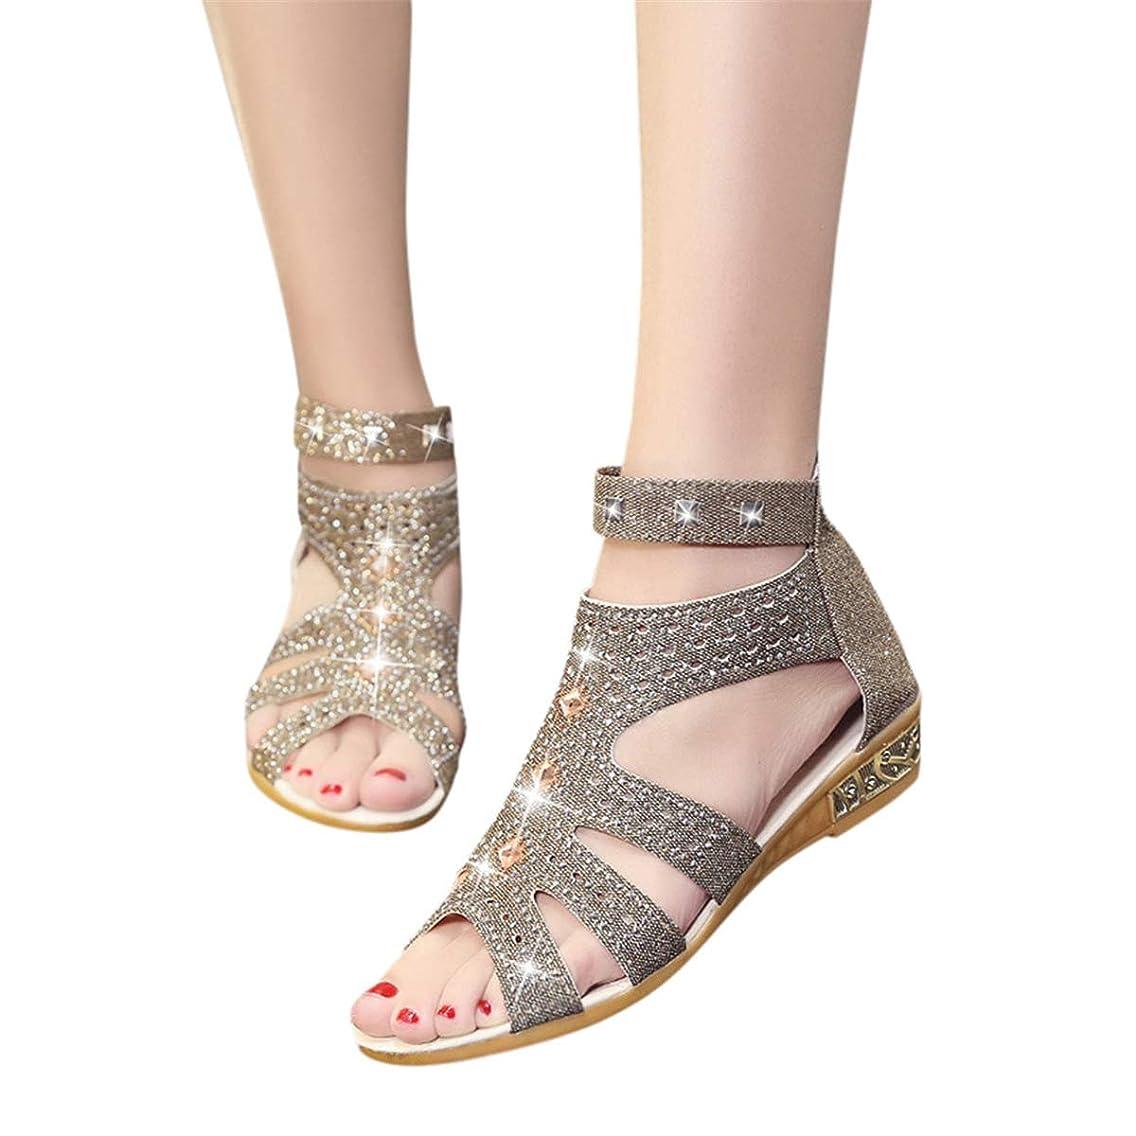 Oasisocean Sandal Platform Sandals for Women 2019 Roma Shoes Sandals Women's Ankle Strap Rhinestones Low Wedge Sandals